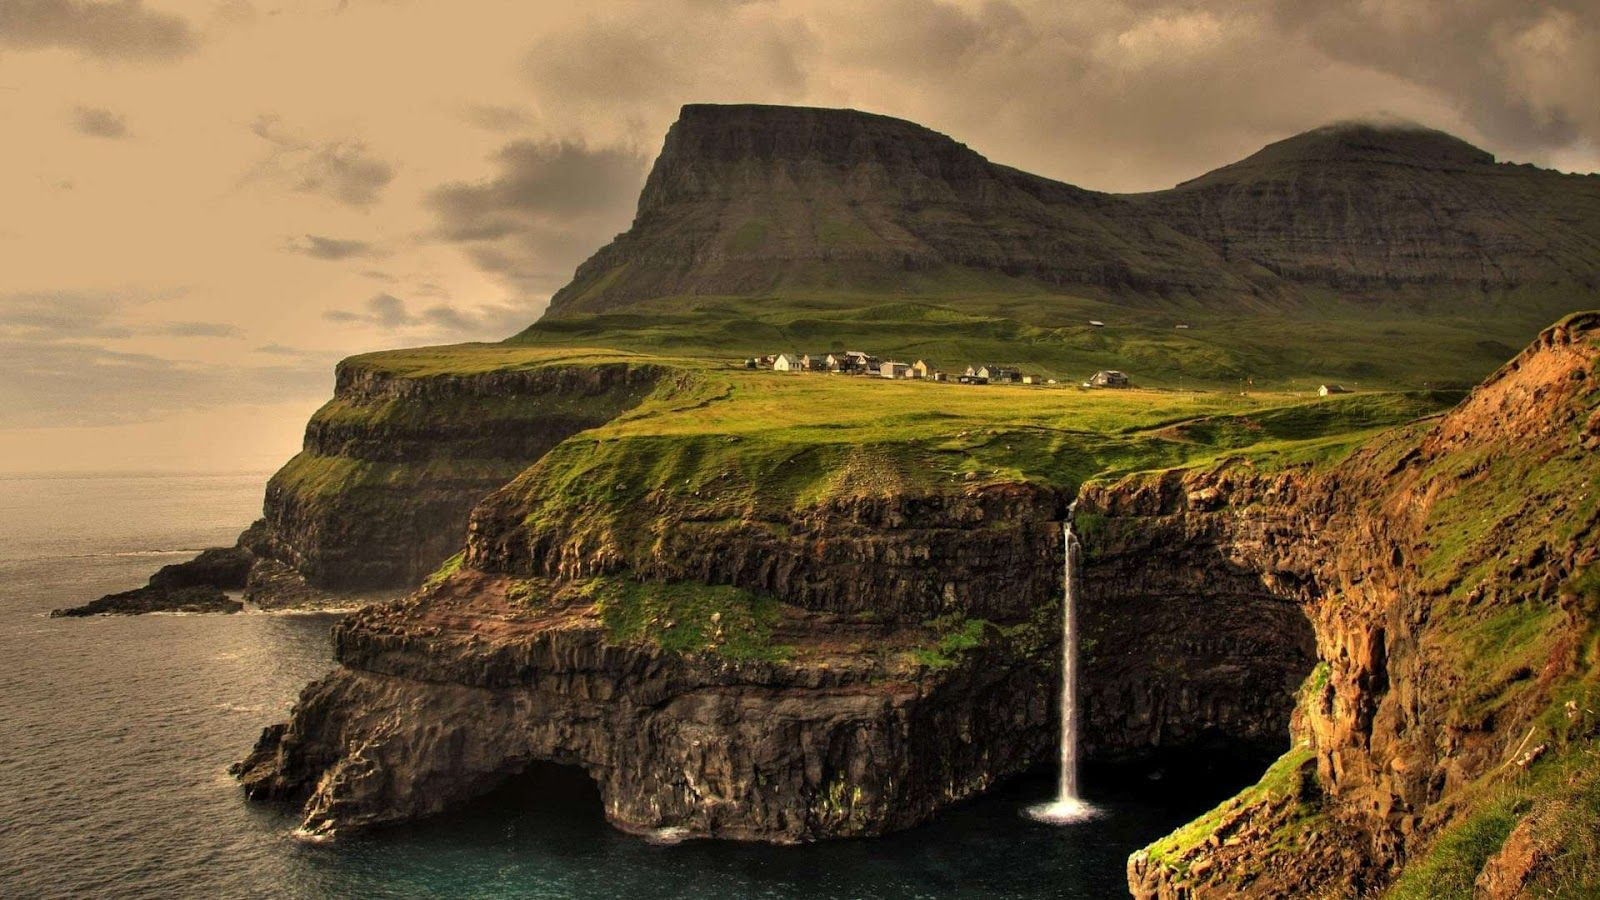 Ireland Landscape Desktop Wallpapers Top Free Ireland Landscape